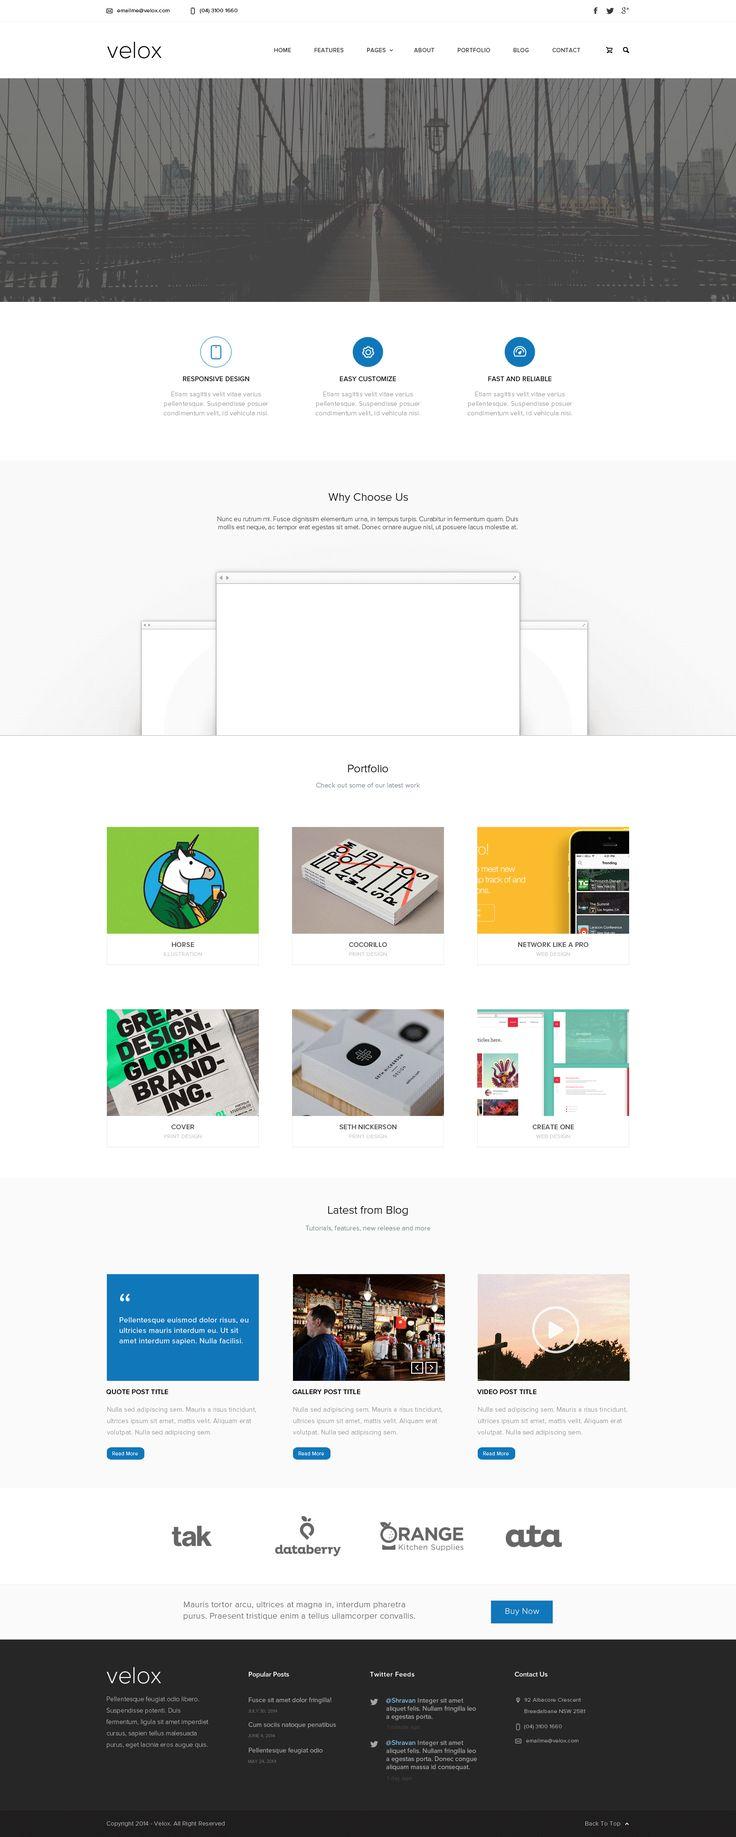 540 best Design | Inspo | Freebies images on Pinterest | Graphic art